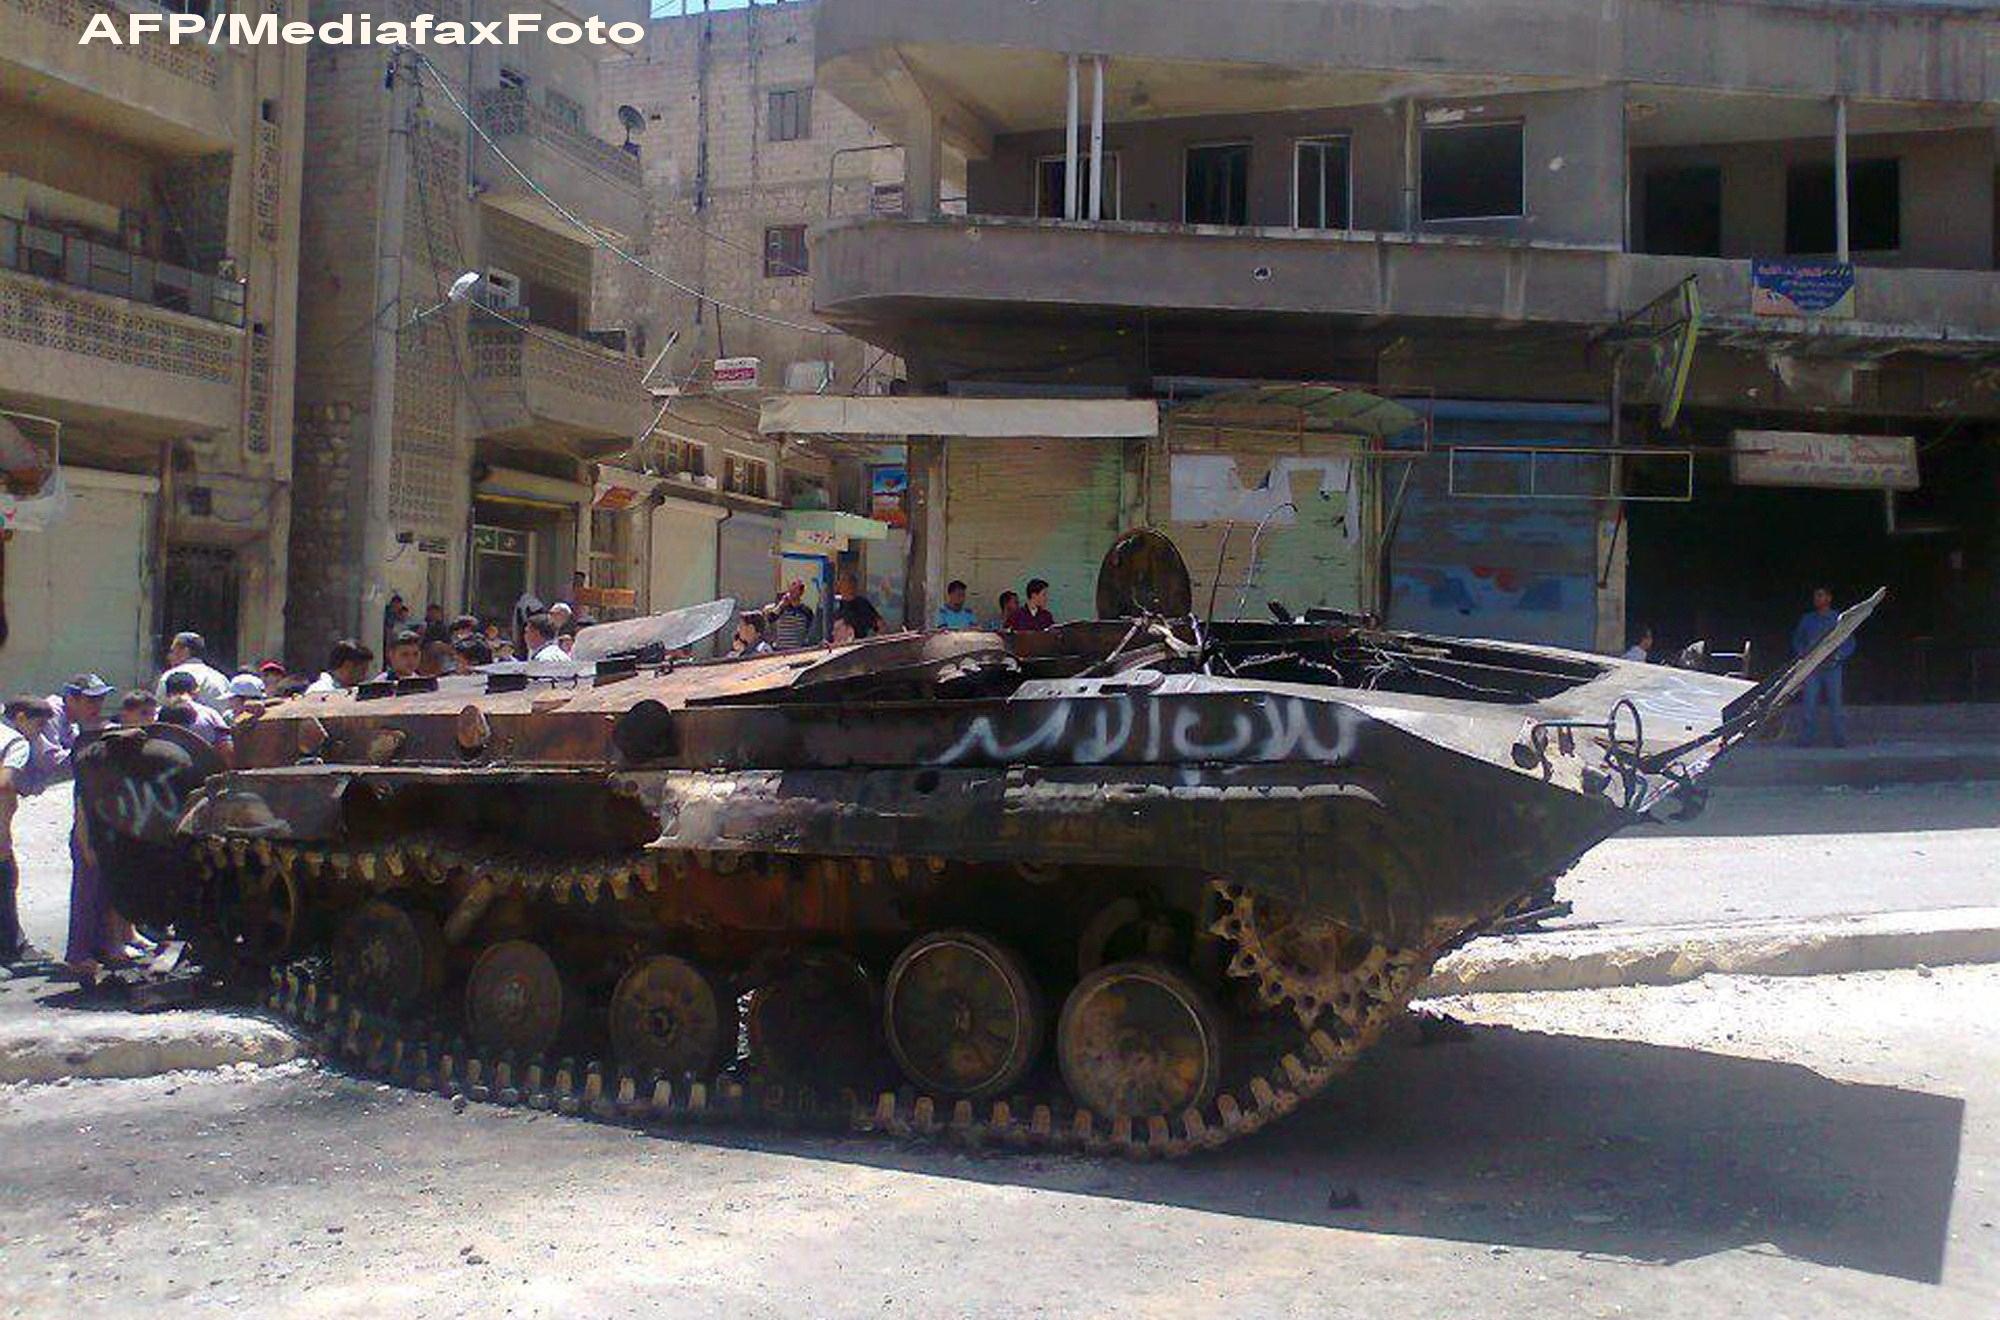 1.260 de persoane au murit in Siria, intr-o saptamana, in confruntarile dintre armata si rebeli